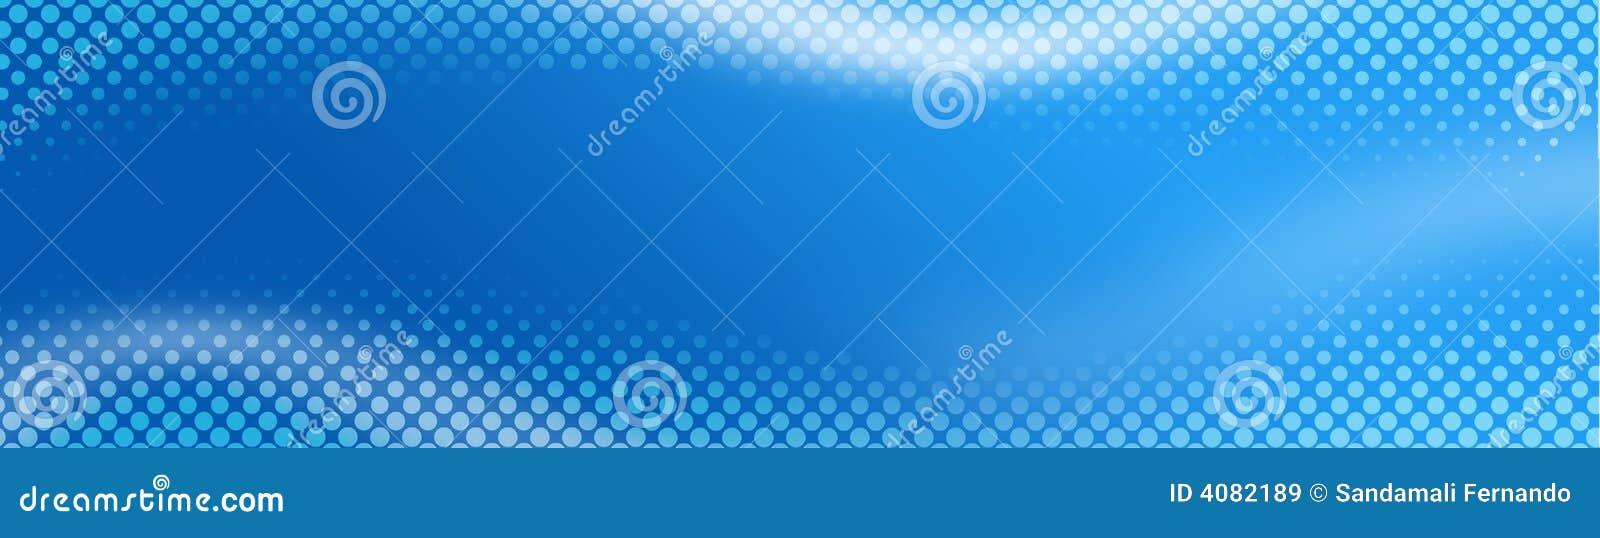 Cabecera/bandera de semitono del Web